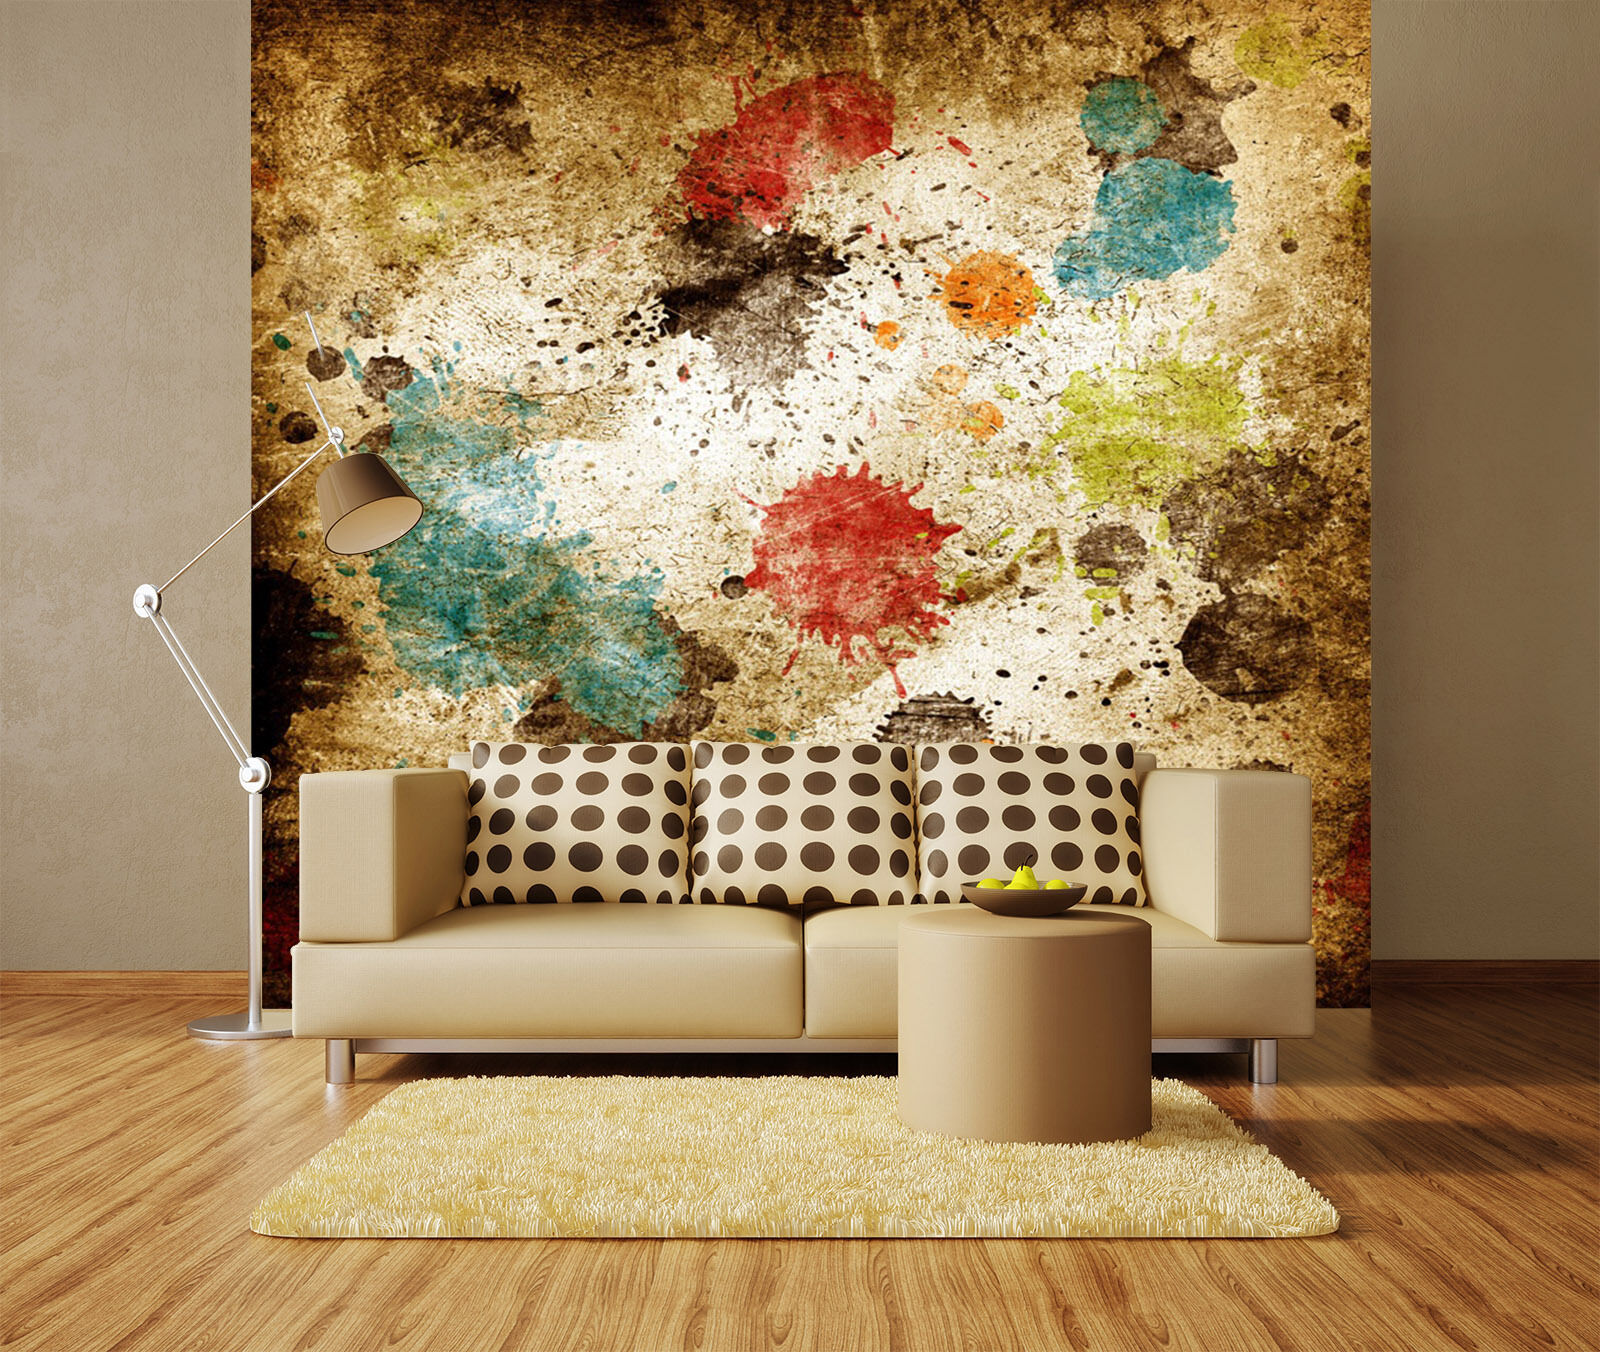 3D Ball, graffiti 230 Wall Paper Print Wall Decal Deco Indoor Wall Murals